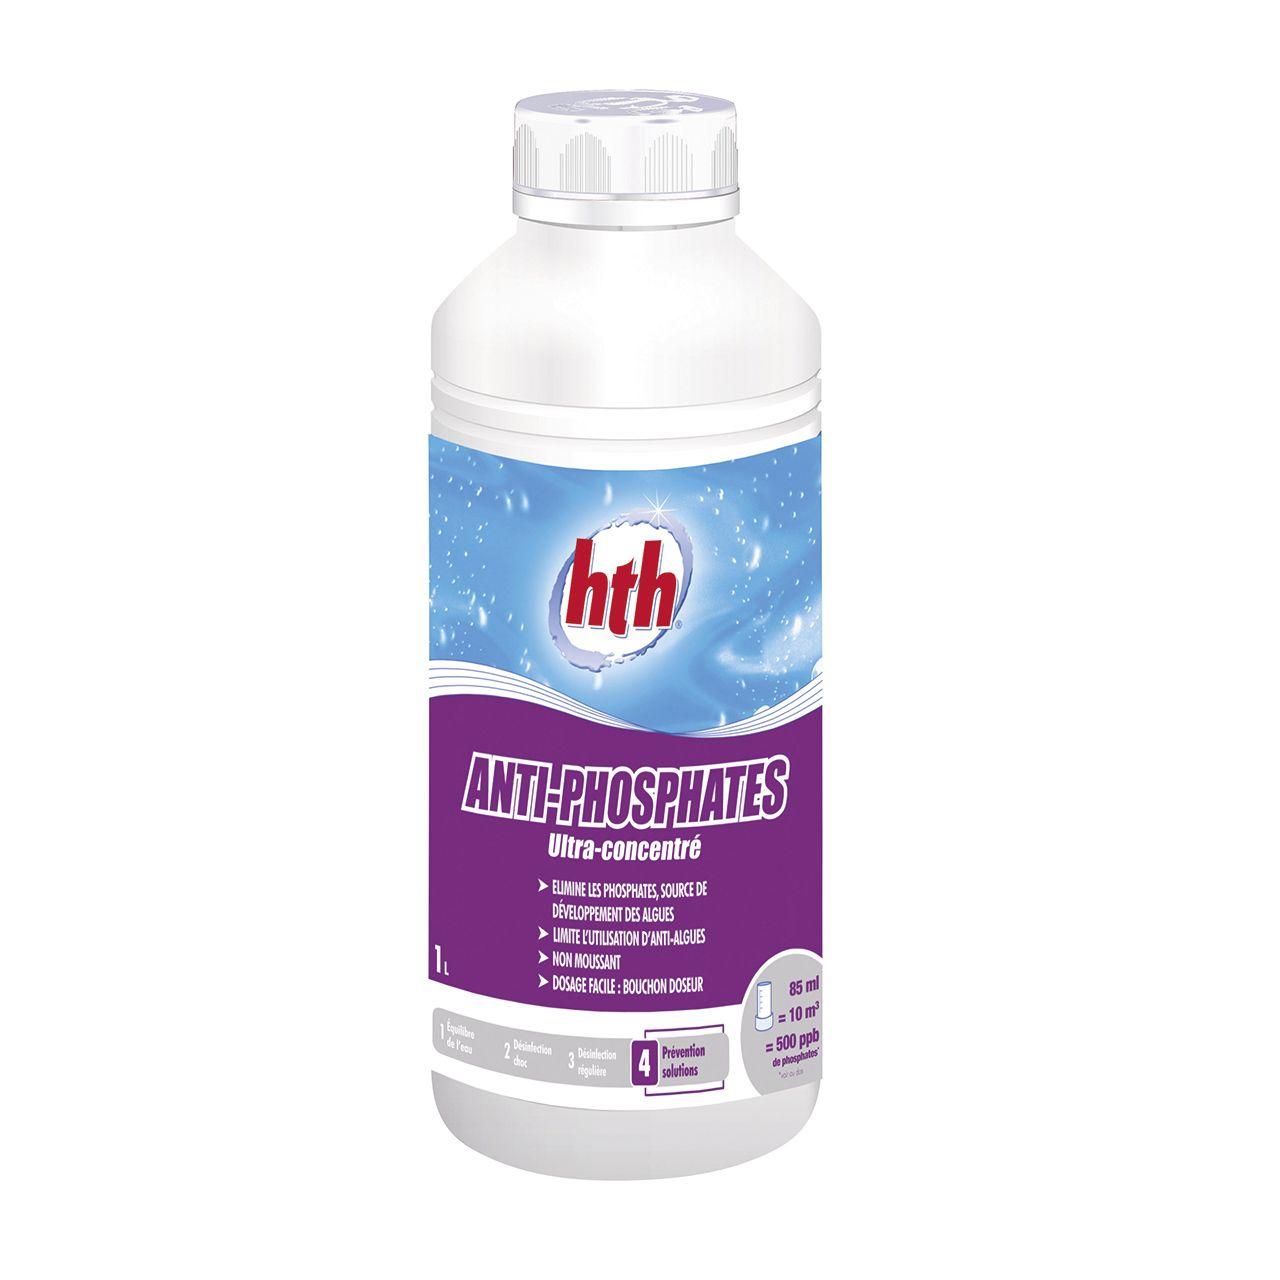 HTH Anti Phospate 1l